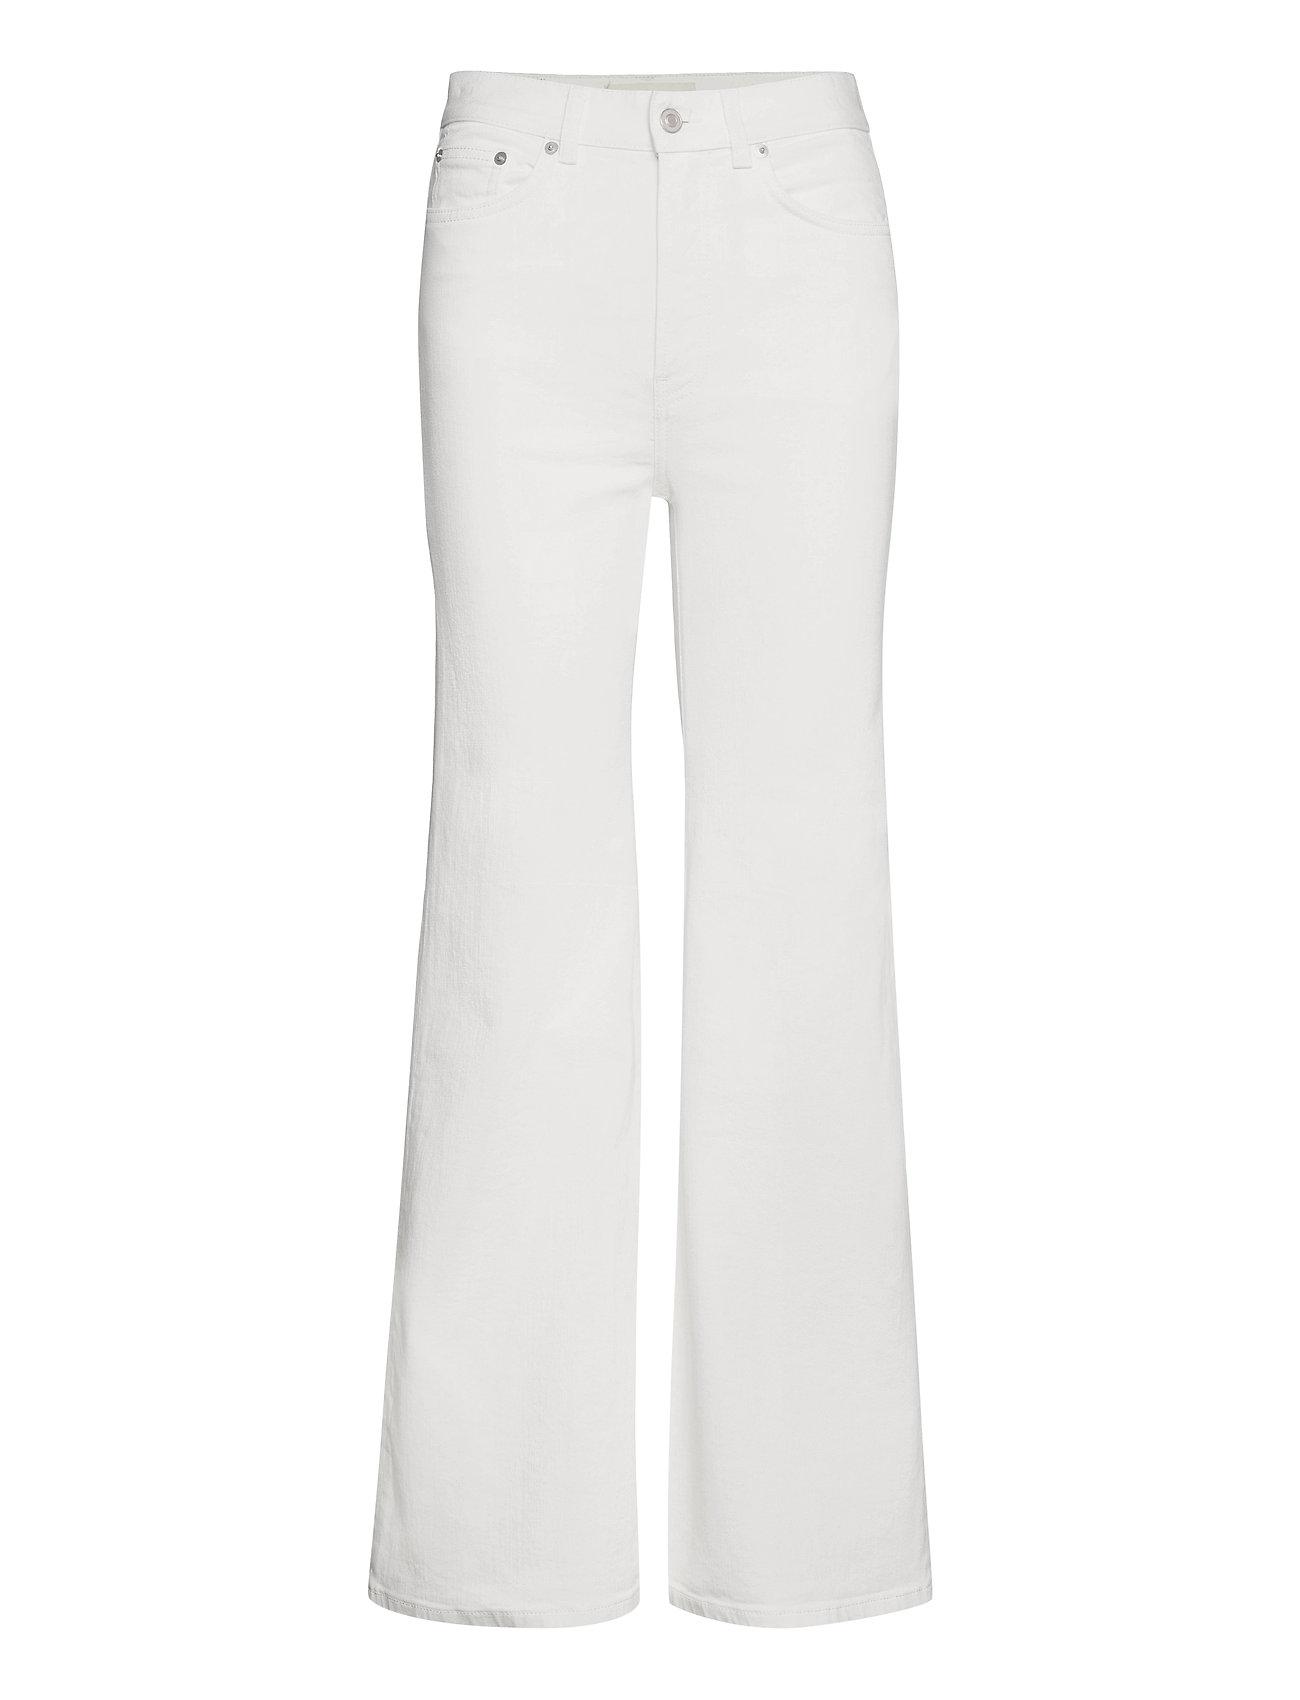 Jeanerica - FW007 - schlaghosen - natural white - 1